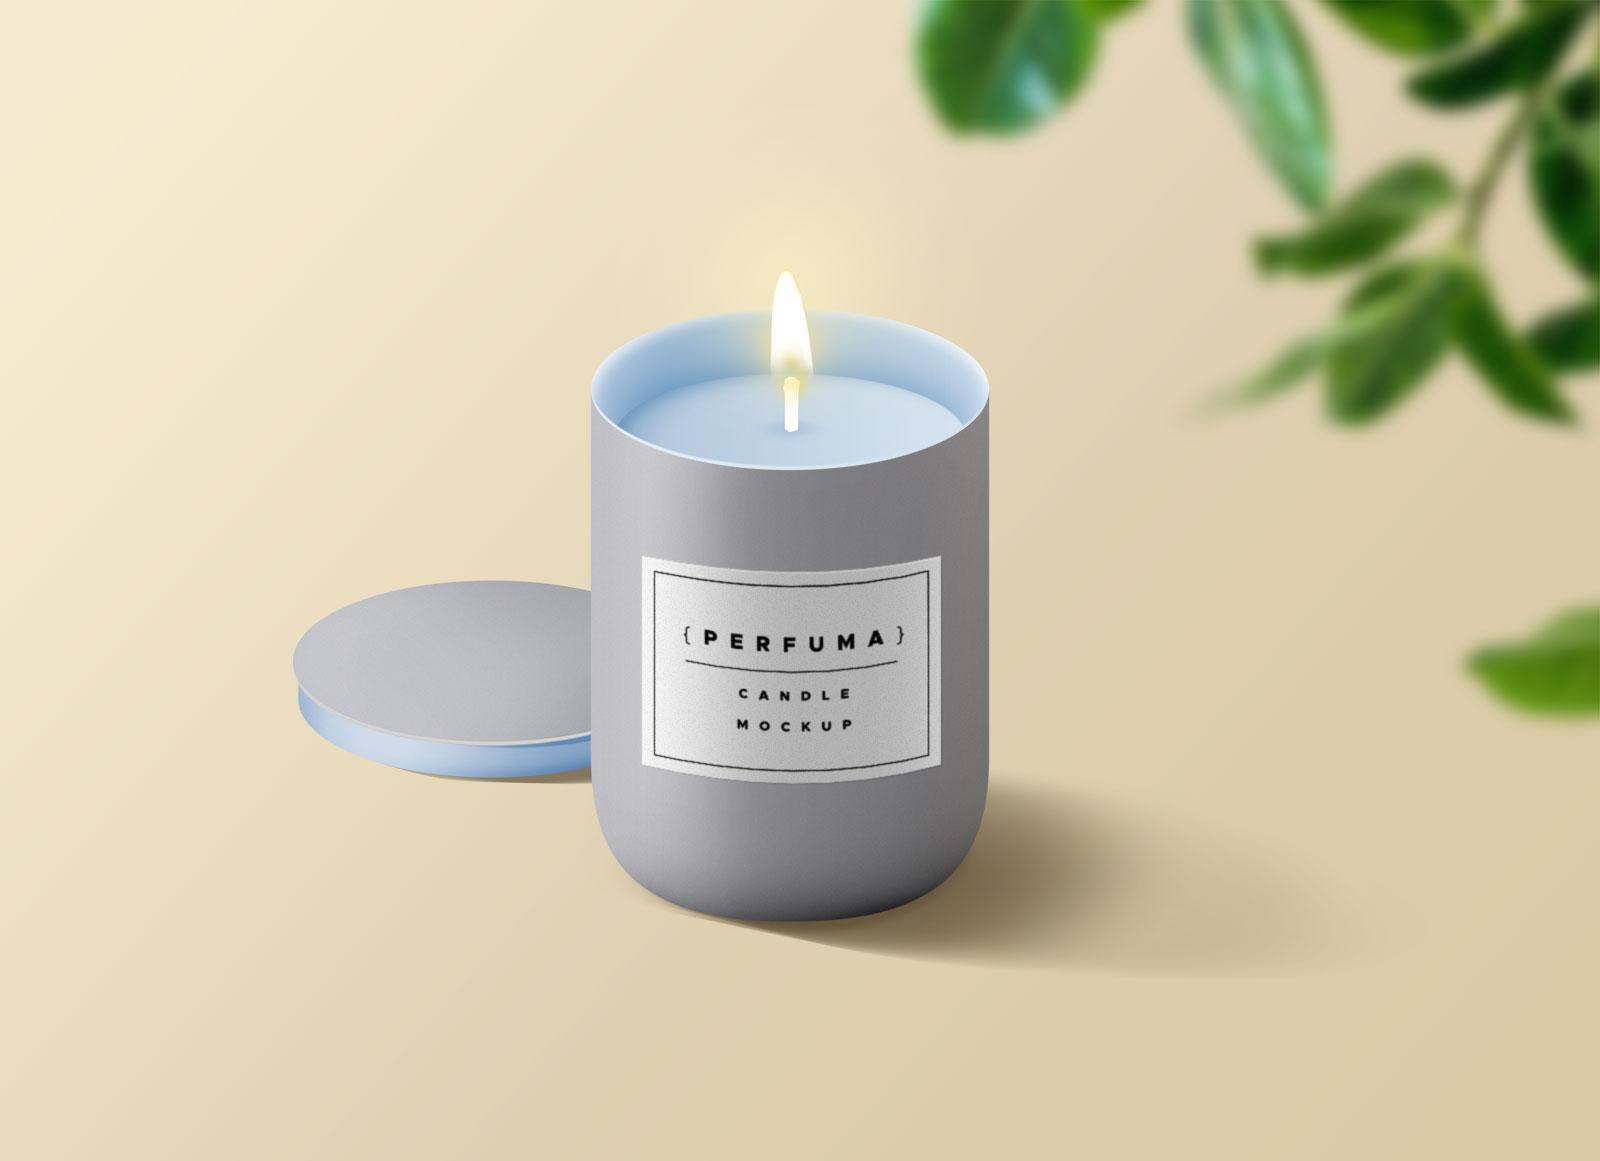 Free-Wax-Candle-Jar-Mockup-PSD-2